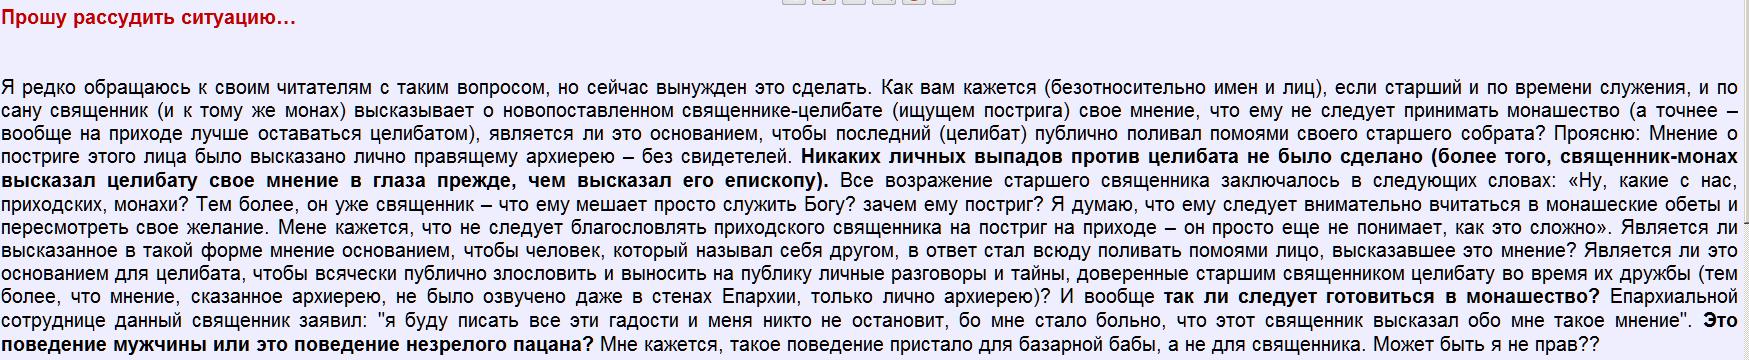 2012-09-26_203040